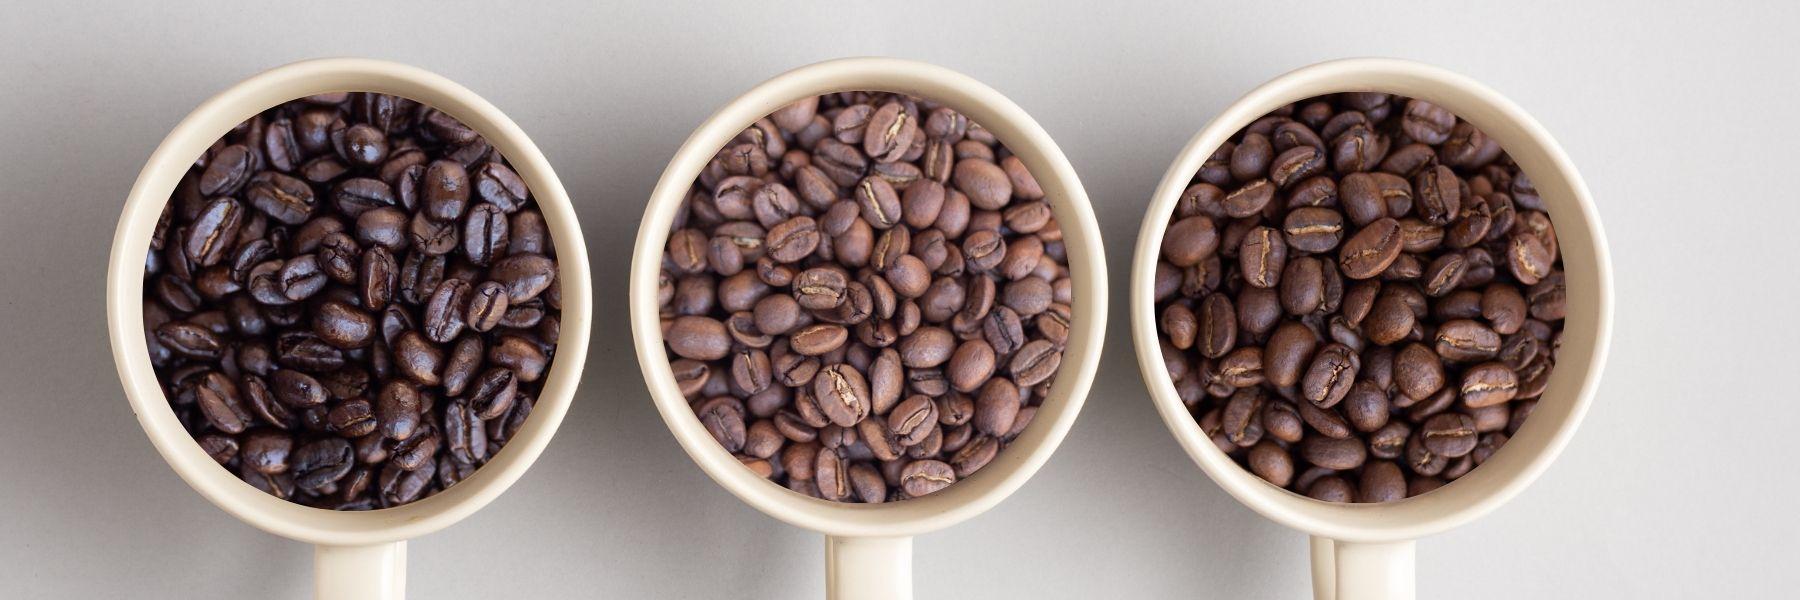 HOPE Coffee Roast Descriptions